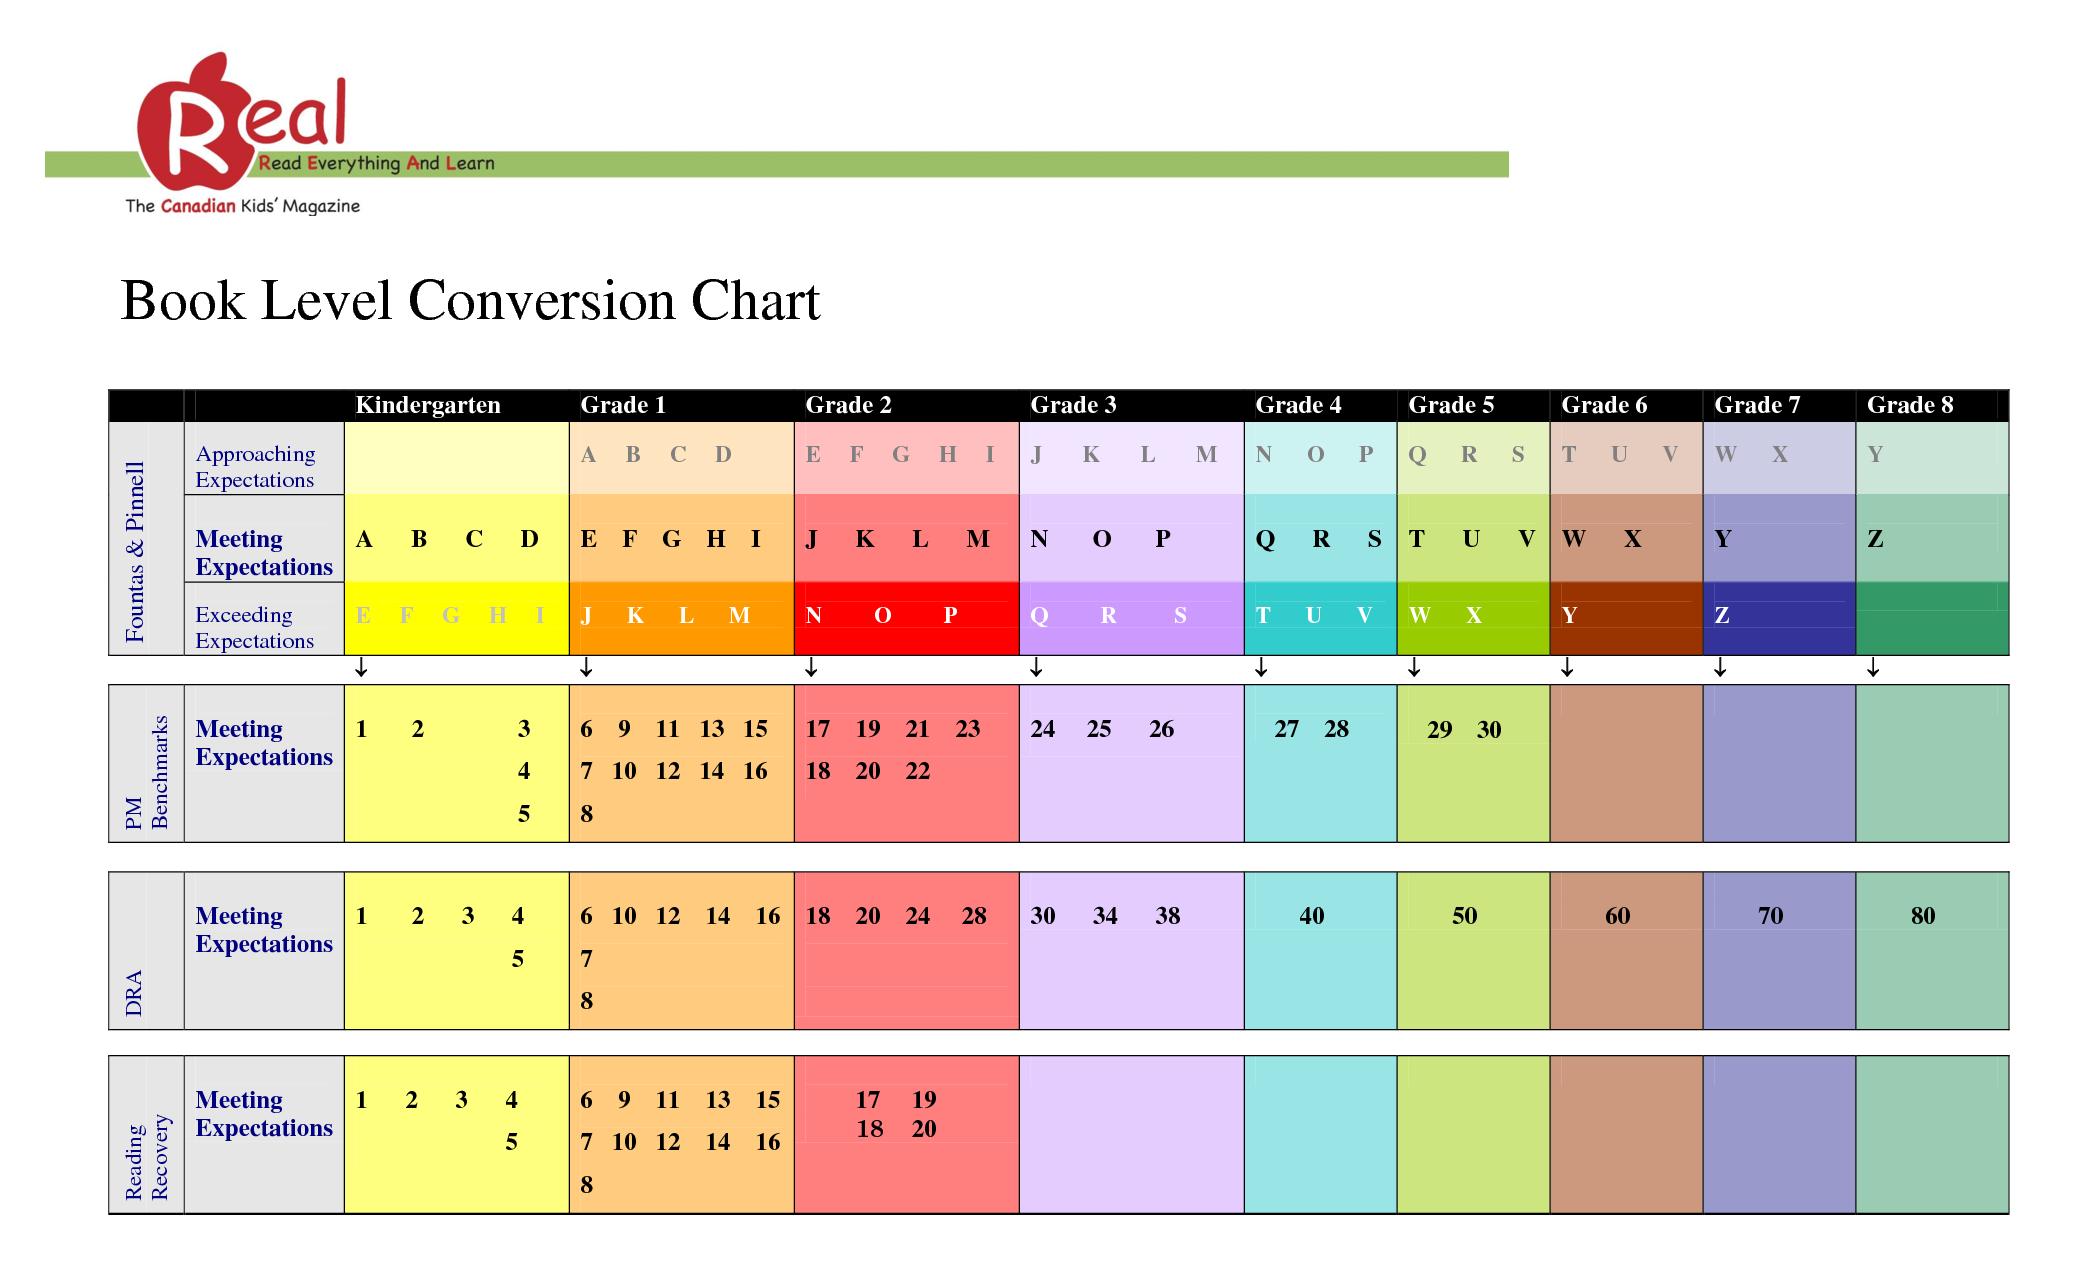 Book Level Conversion Chart